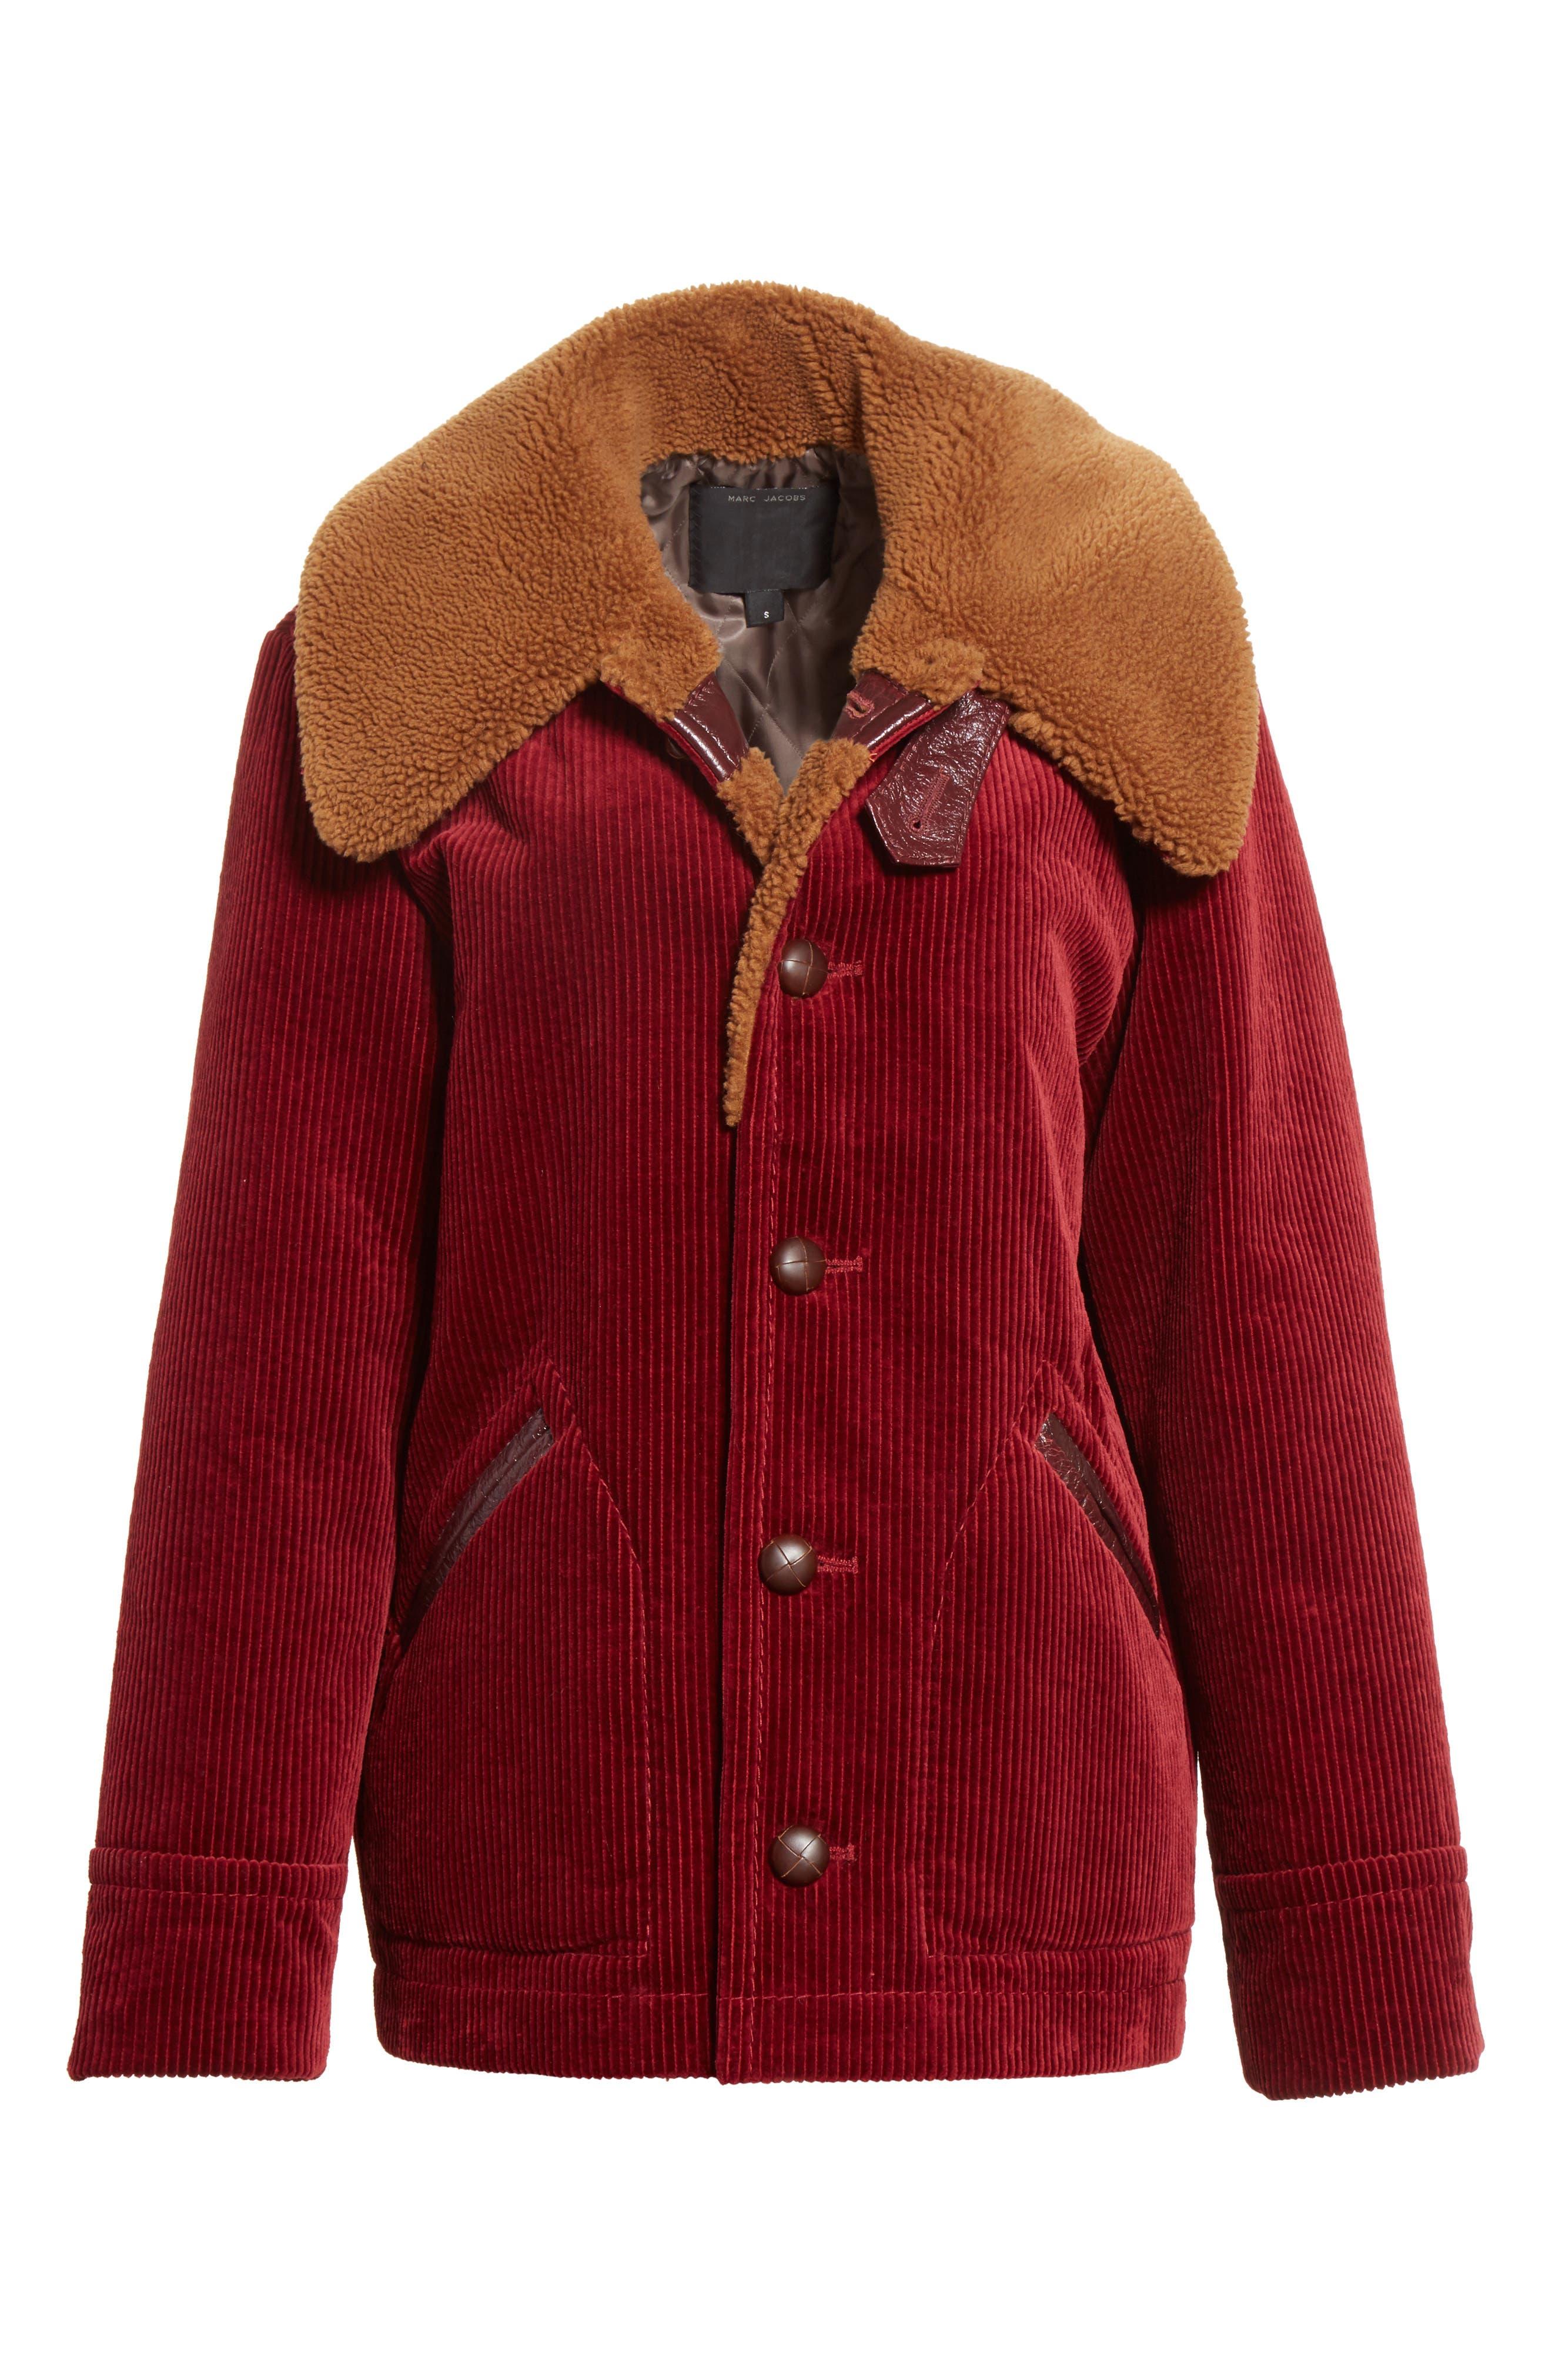 Corduroy Coat with Faux Shearling Collar,                             Alternate thumbnail 7, color,                             Bordeaux